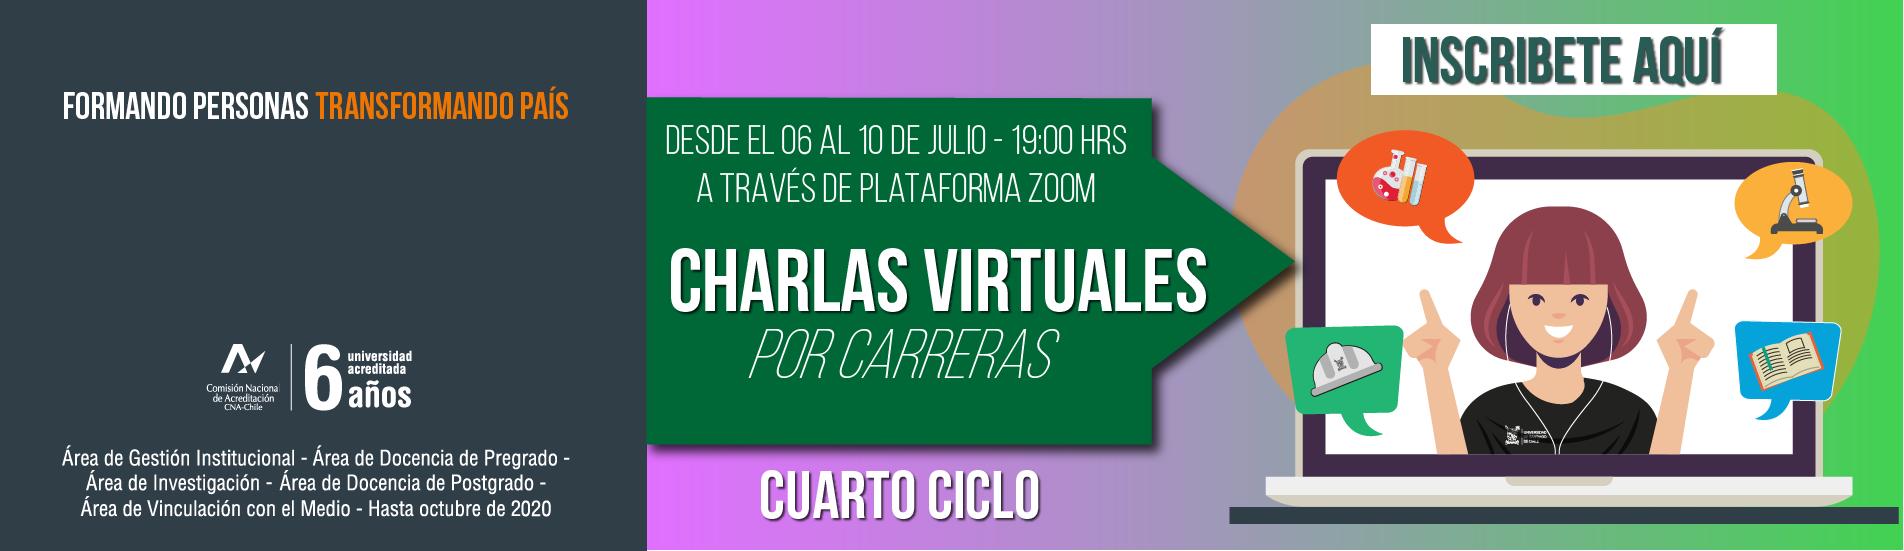 USACH: CHARLAS VIRTUALES